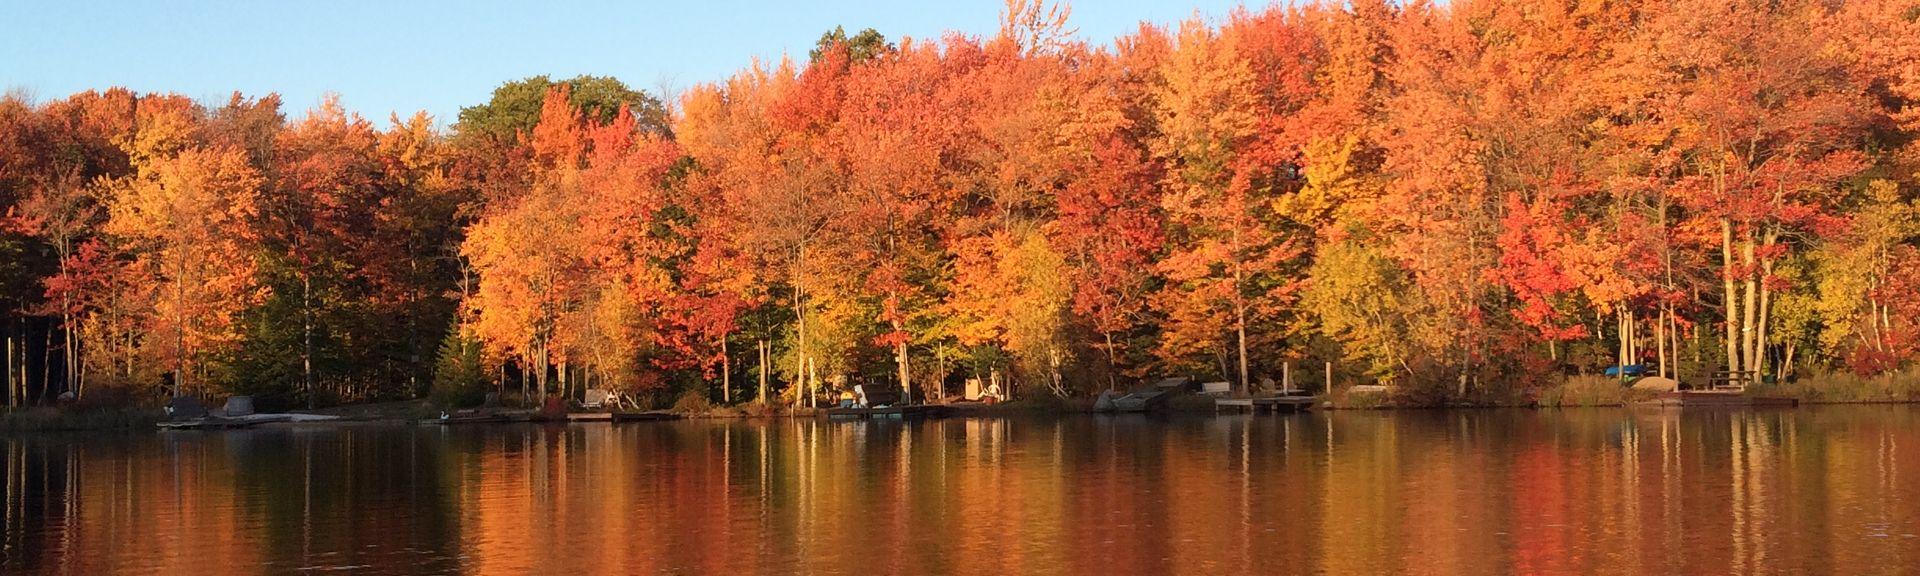 Lehigh Township, Wayne County, PA, USA